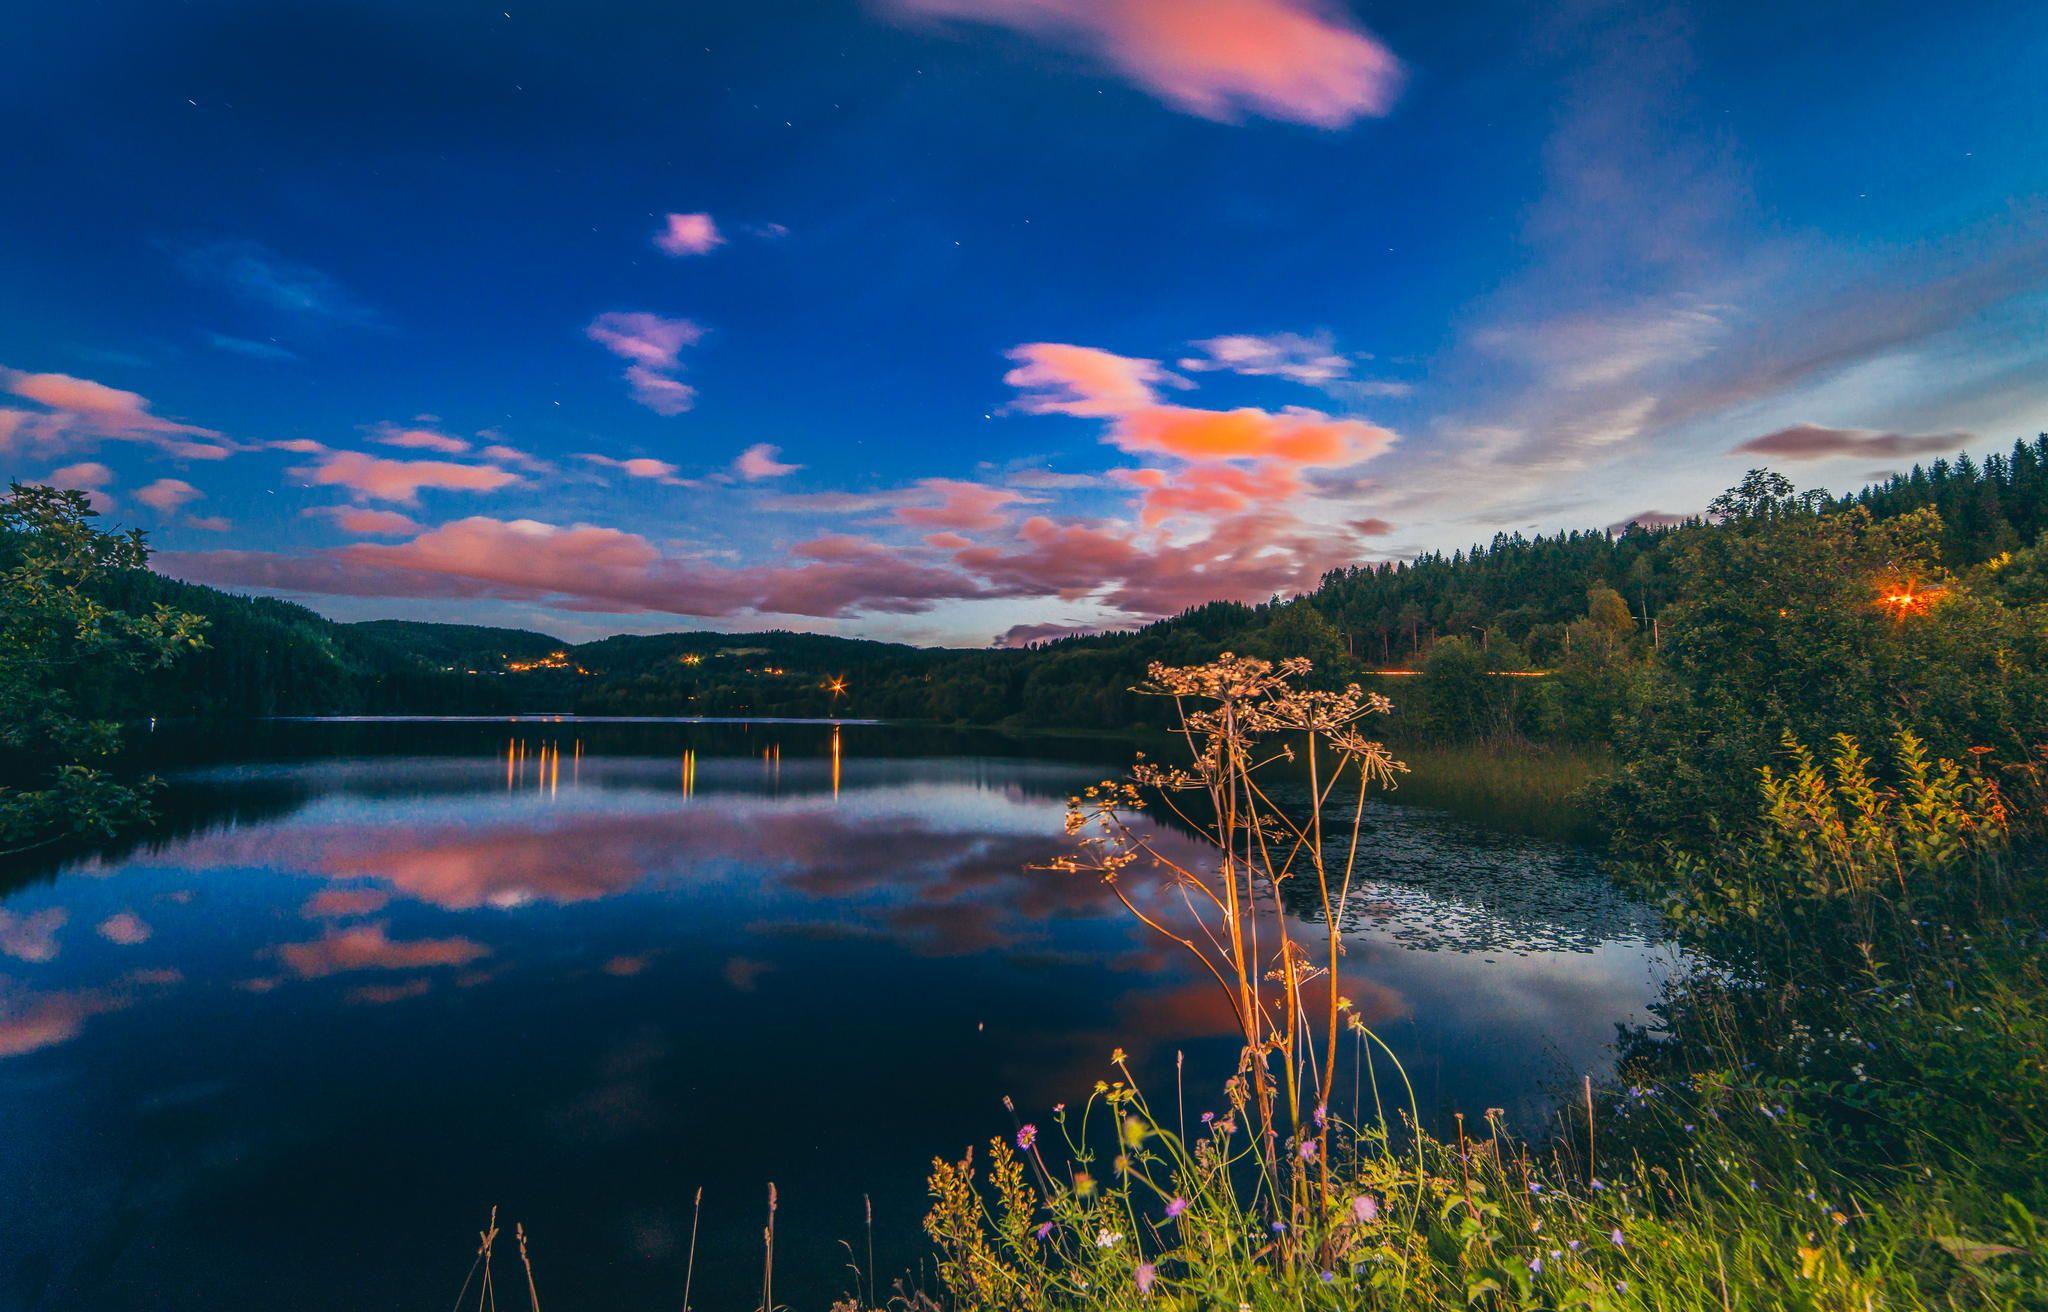 Jonsvatnet,, Trondheim  by Aziz Nasuti on 500px